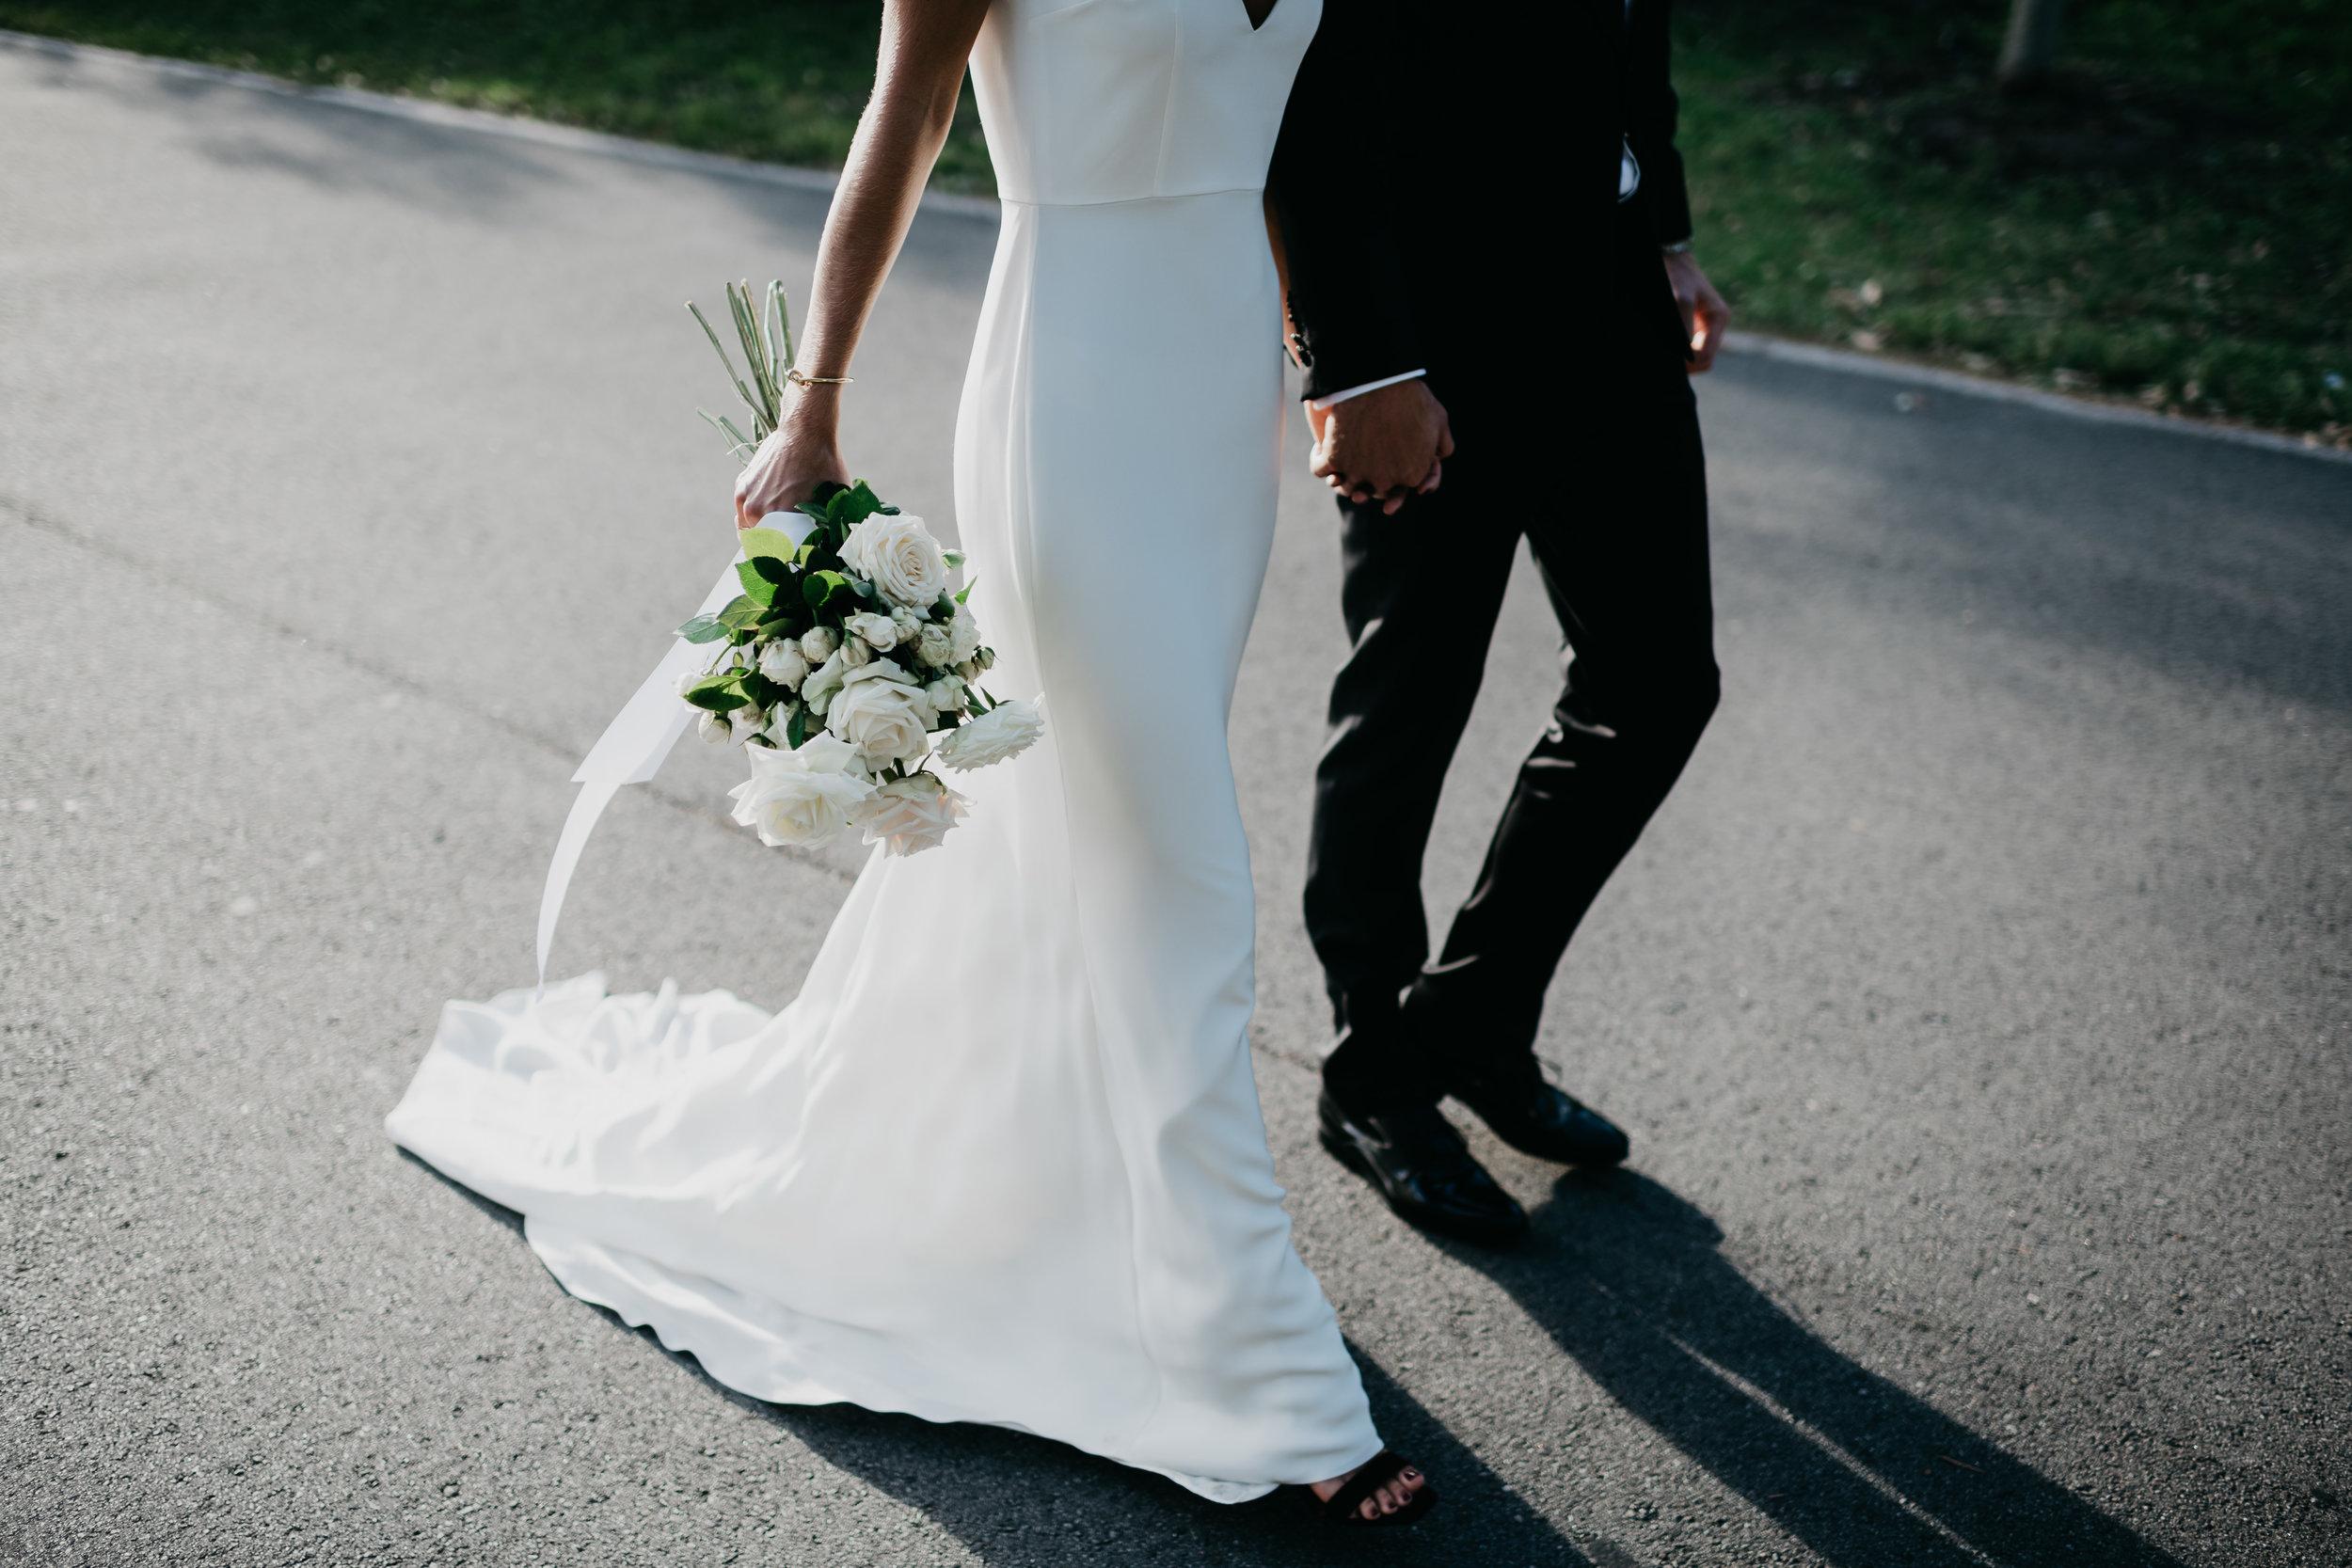 about_me_jason_corroto-wedding_photography_candid_modern_romantic_sydney